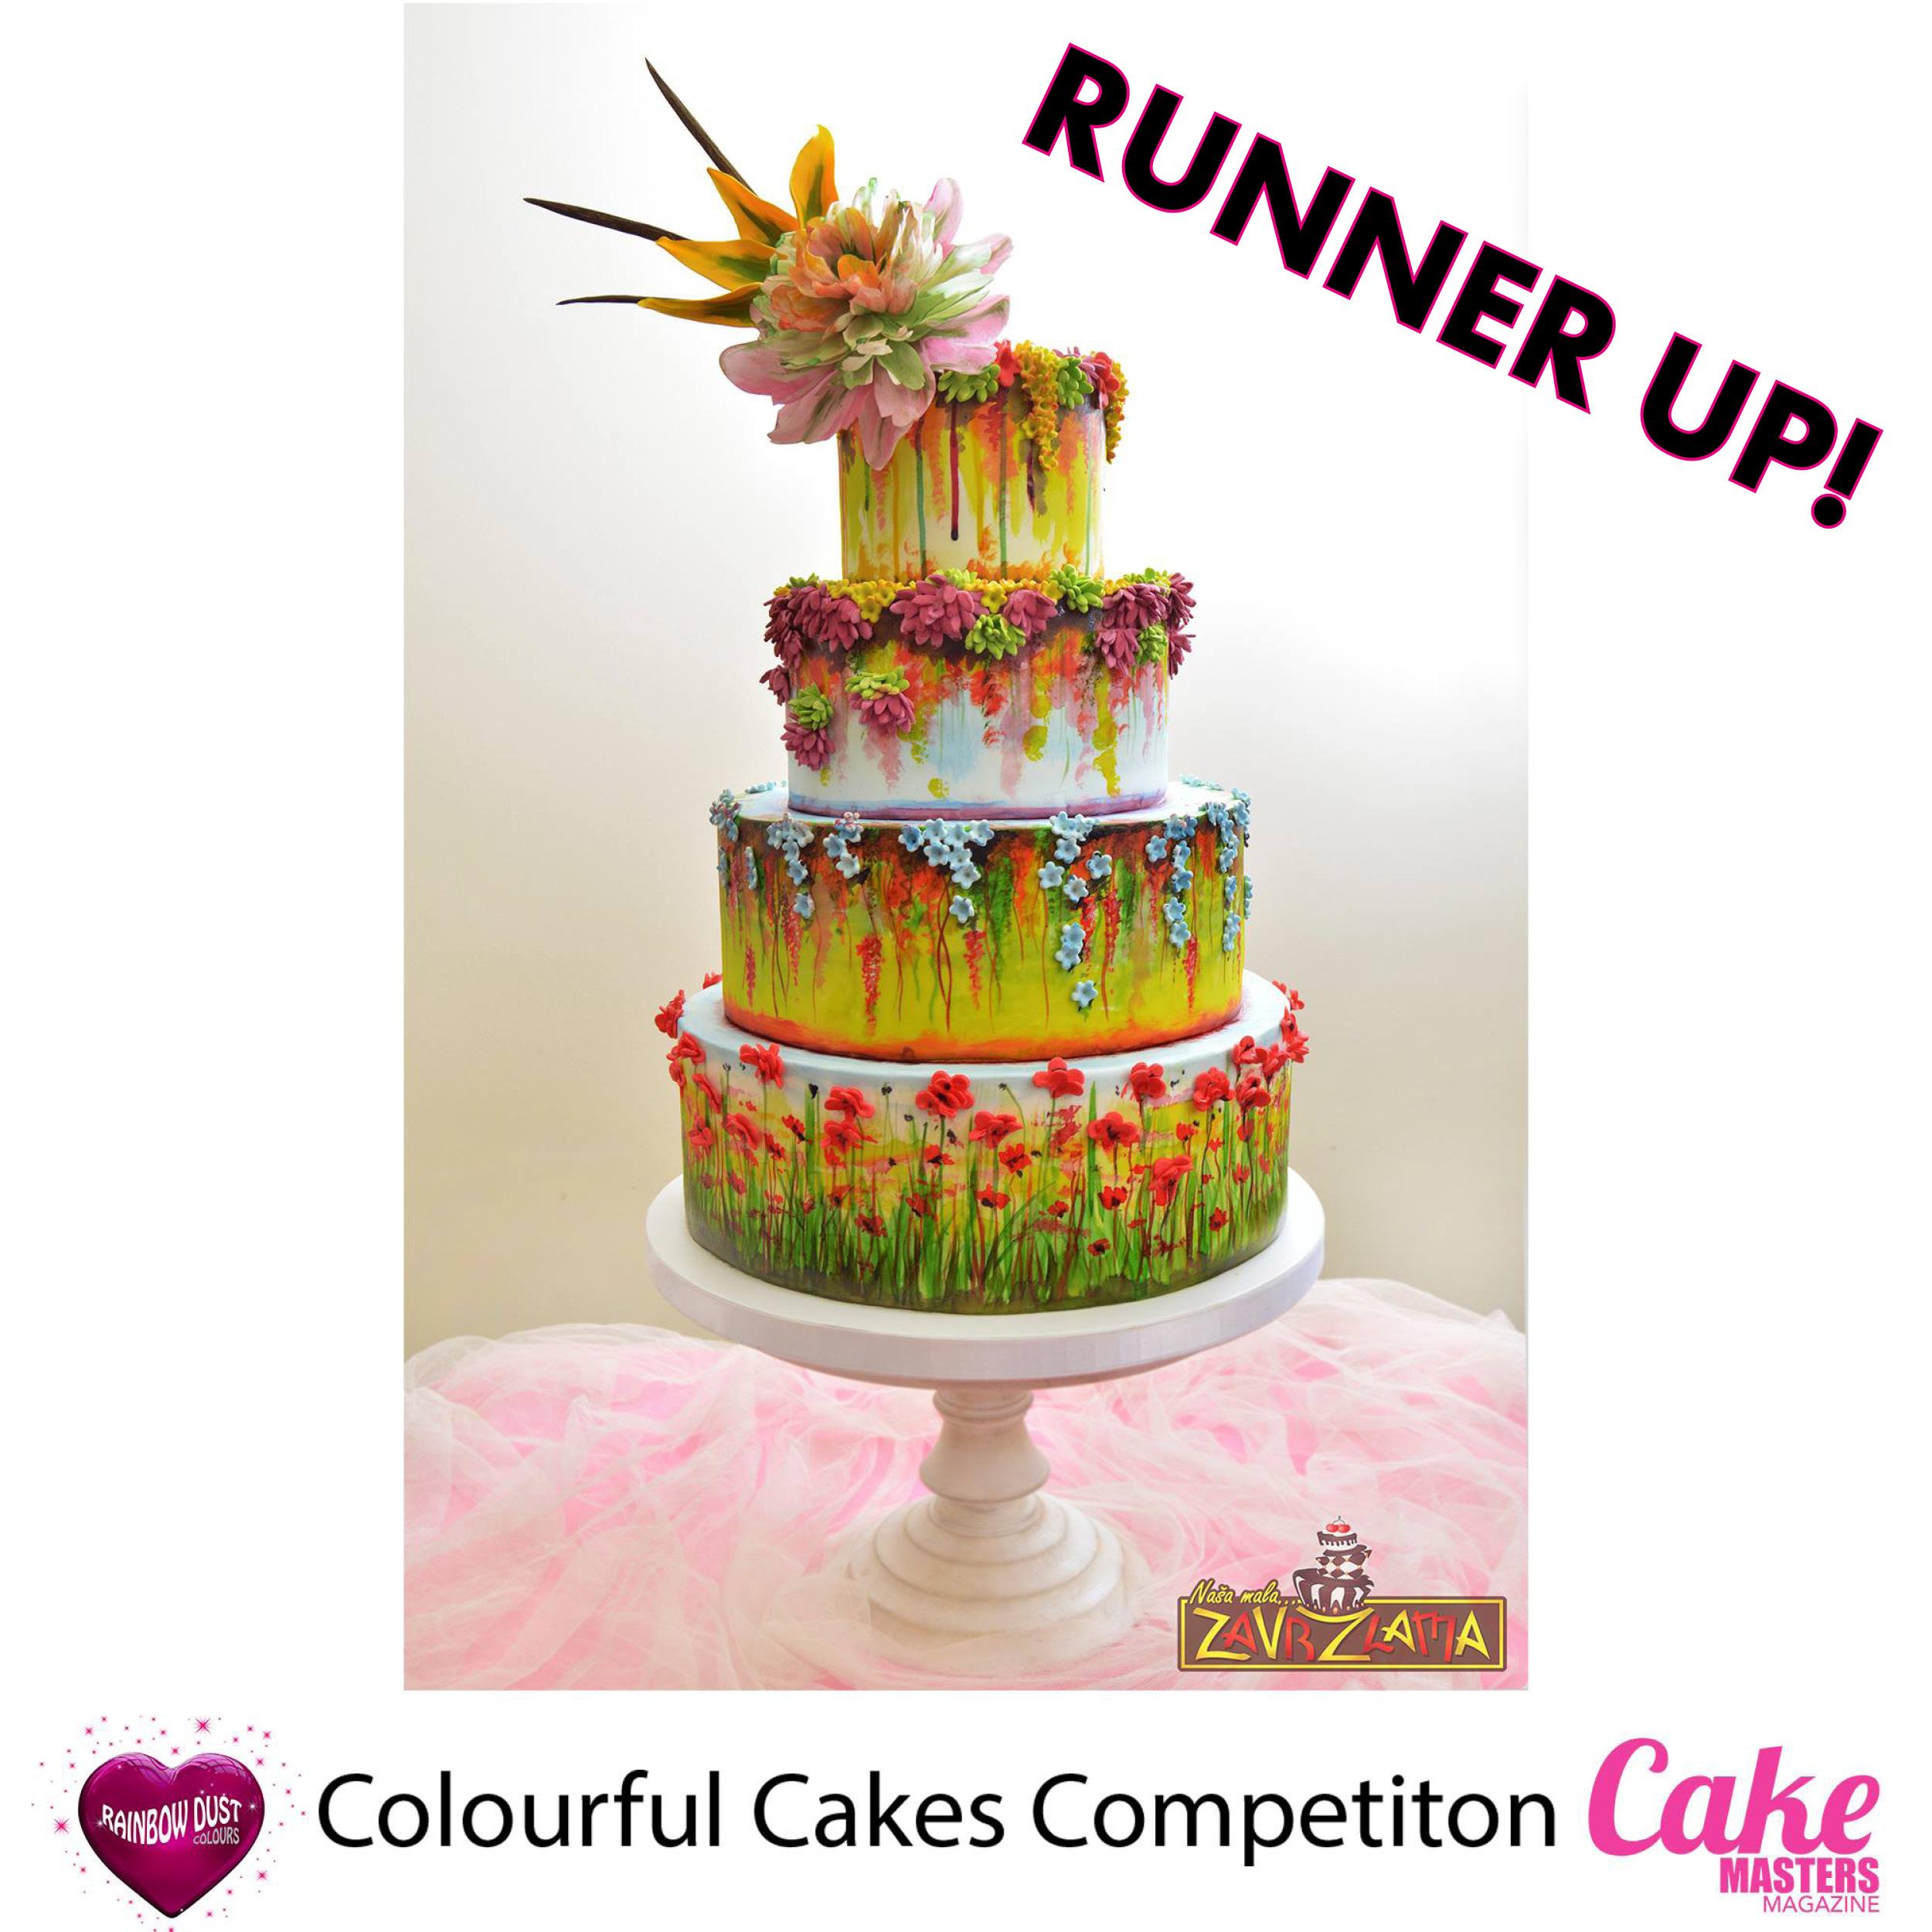 Colourful Cakes Comp FB - Runner Up Nasa Mala Zavrzlama